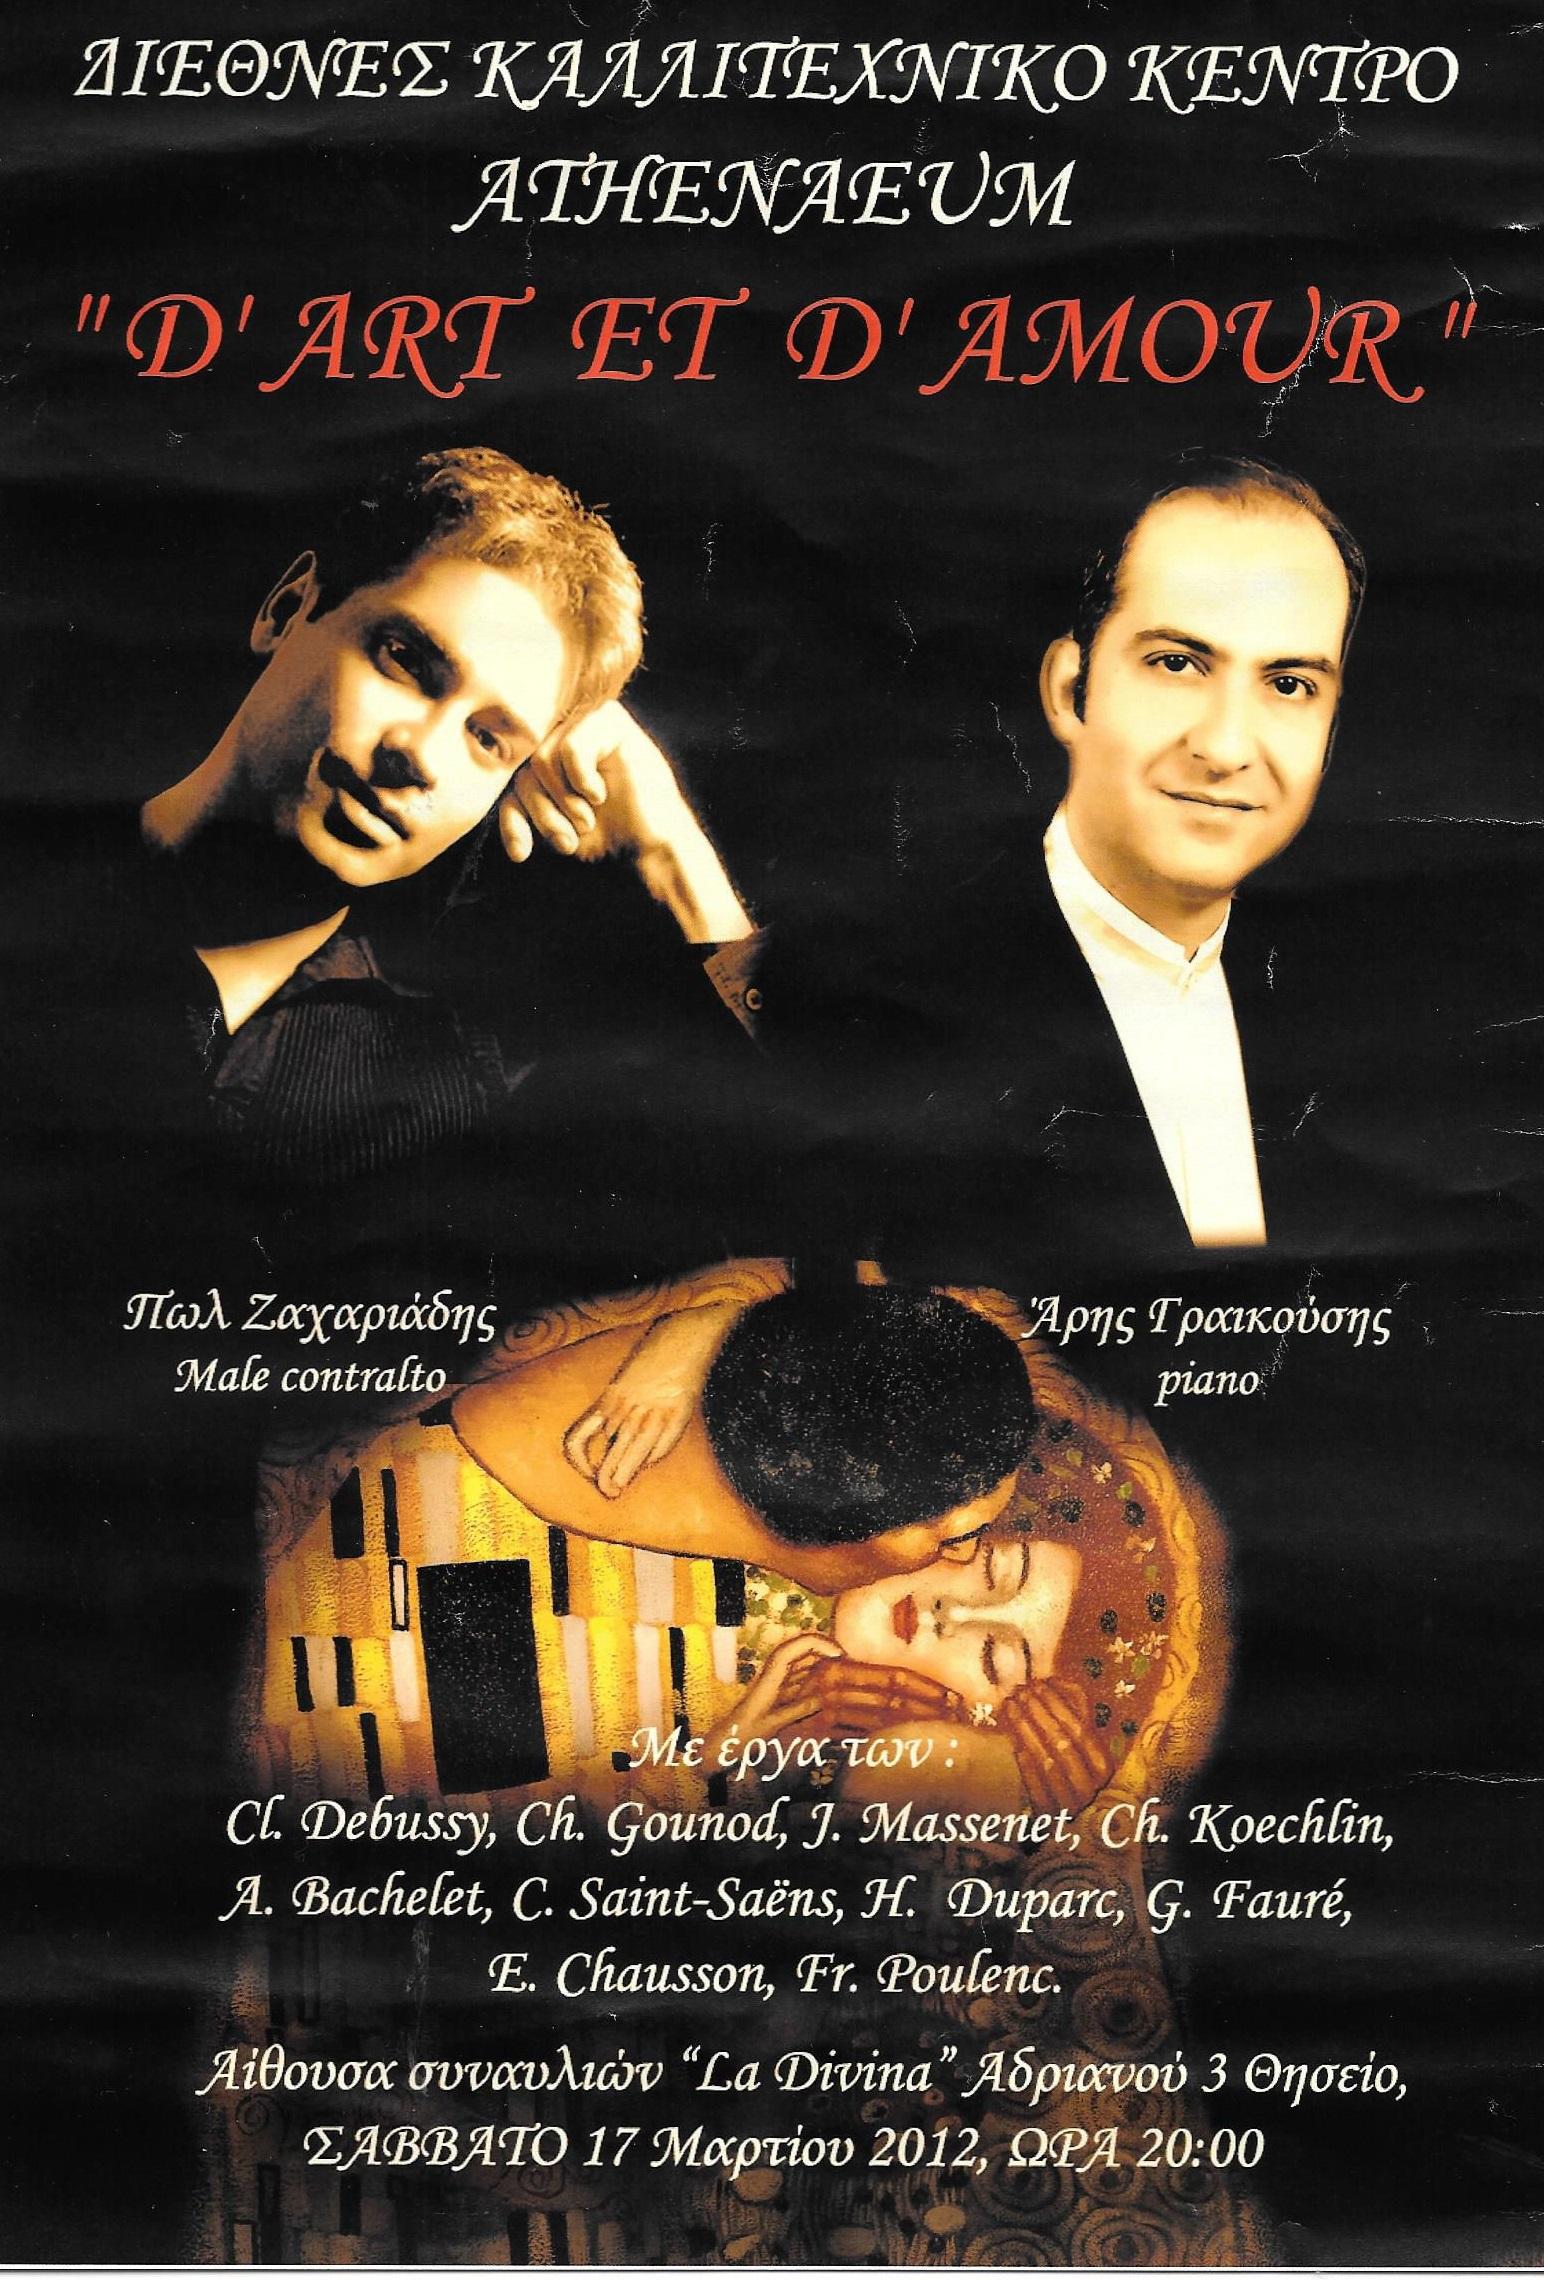 D' art et d' amour. Πωλ Ζαχαριάδης (male contrato) και Άρης Γραικούσης (piano)